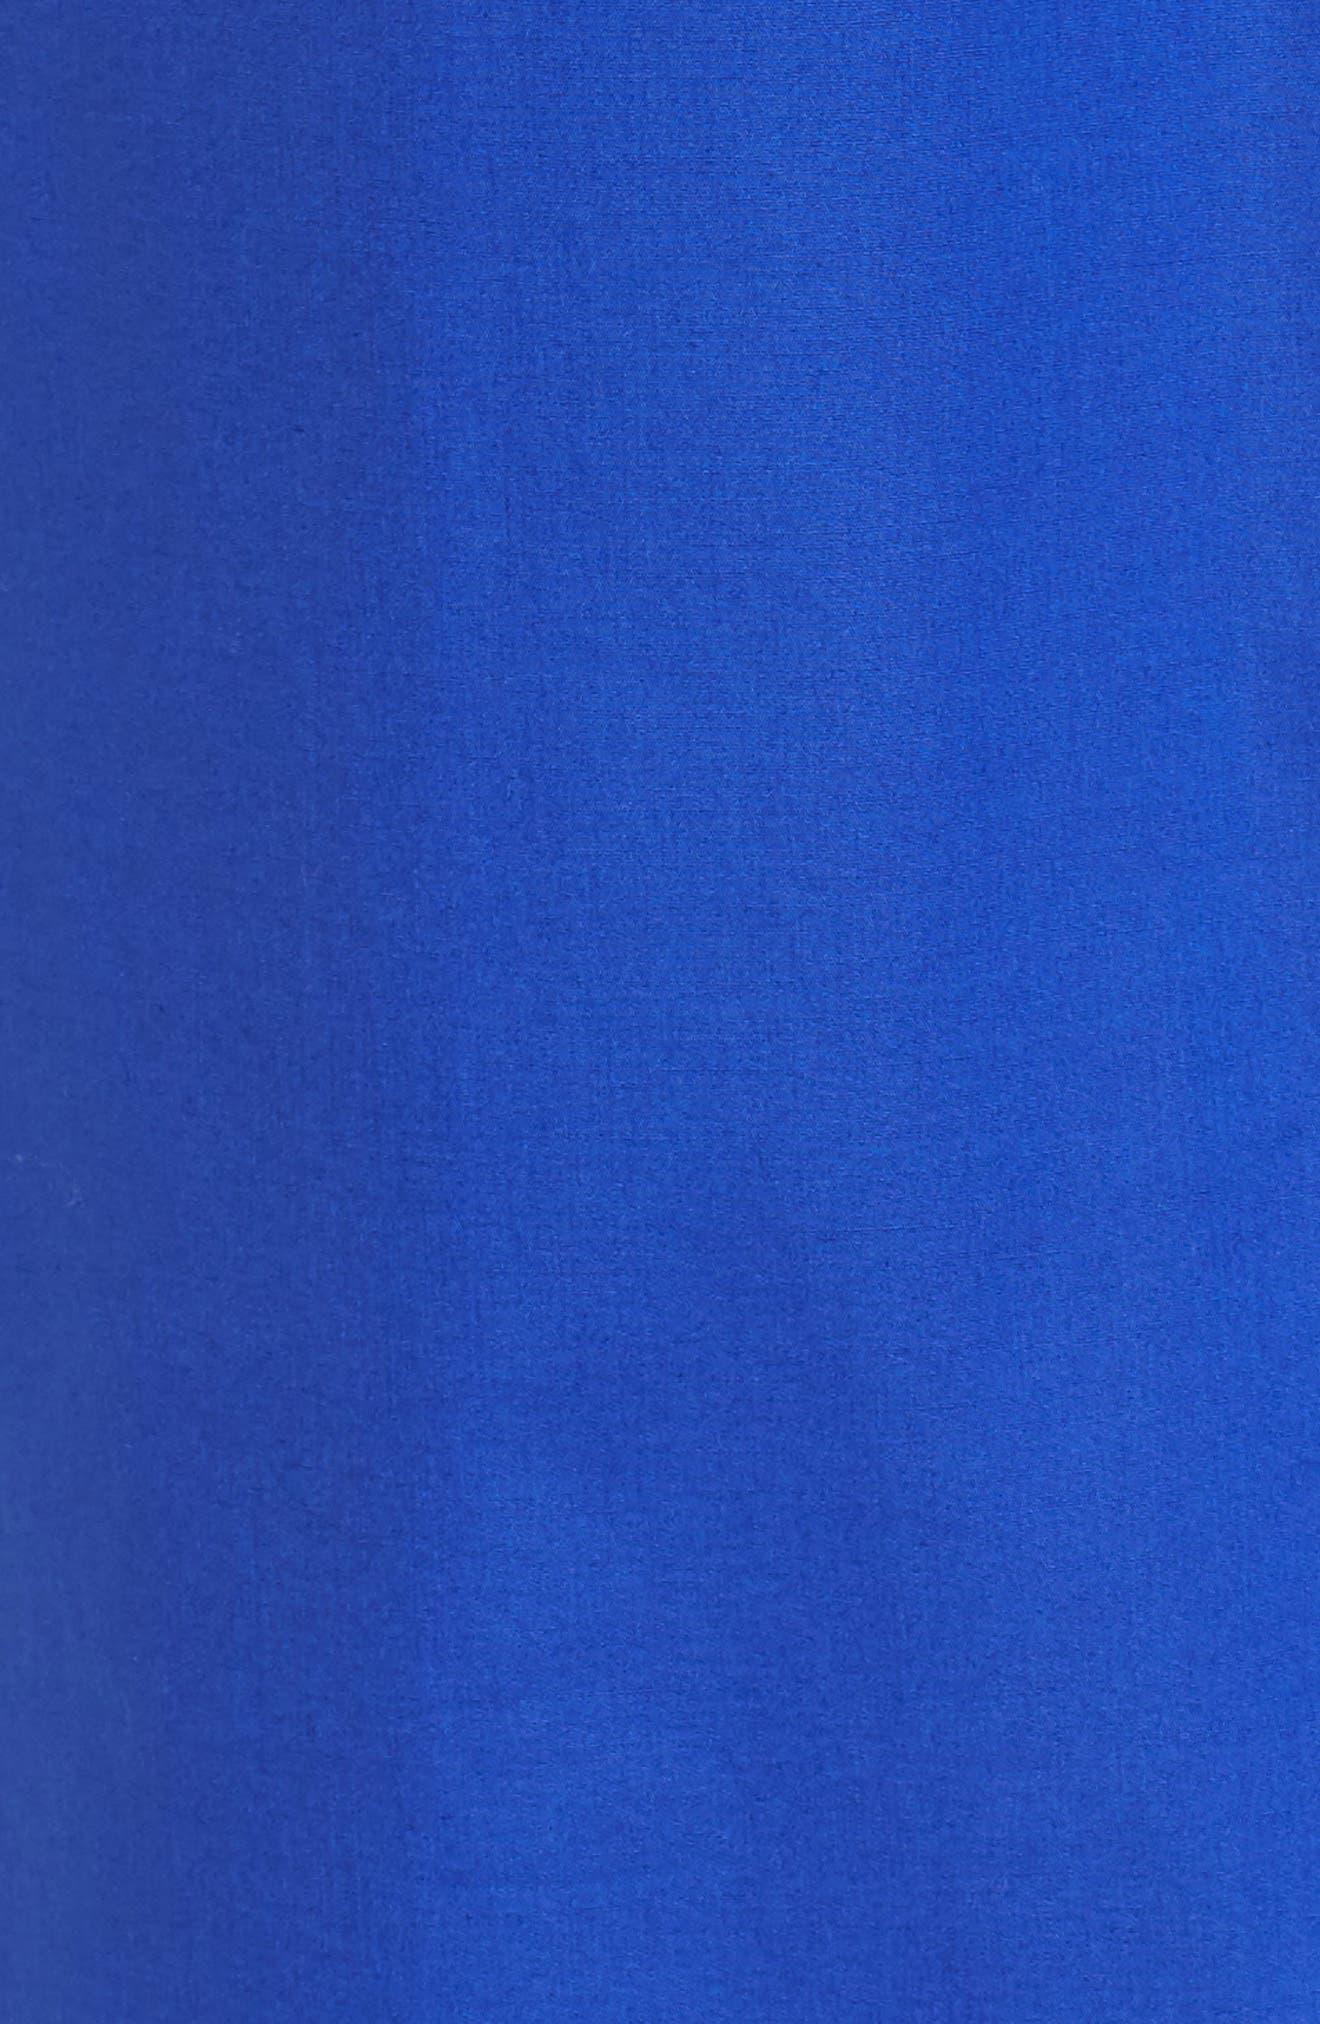 Dashir Stretch Cotton Shirtdress,                             Alternate thumbnail 5, color,                             438